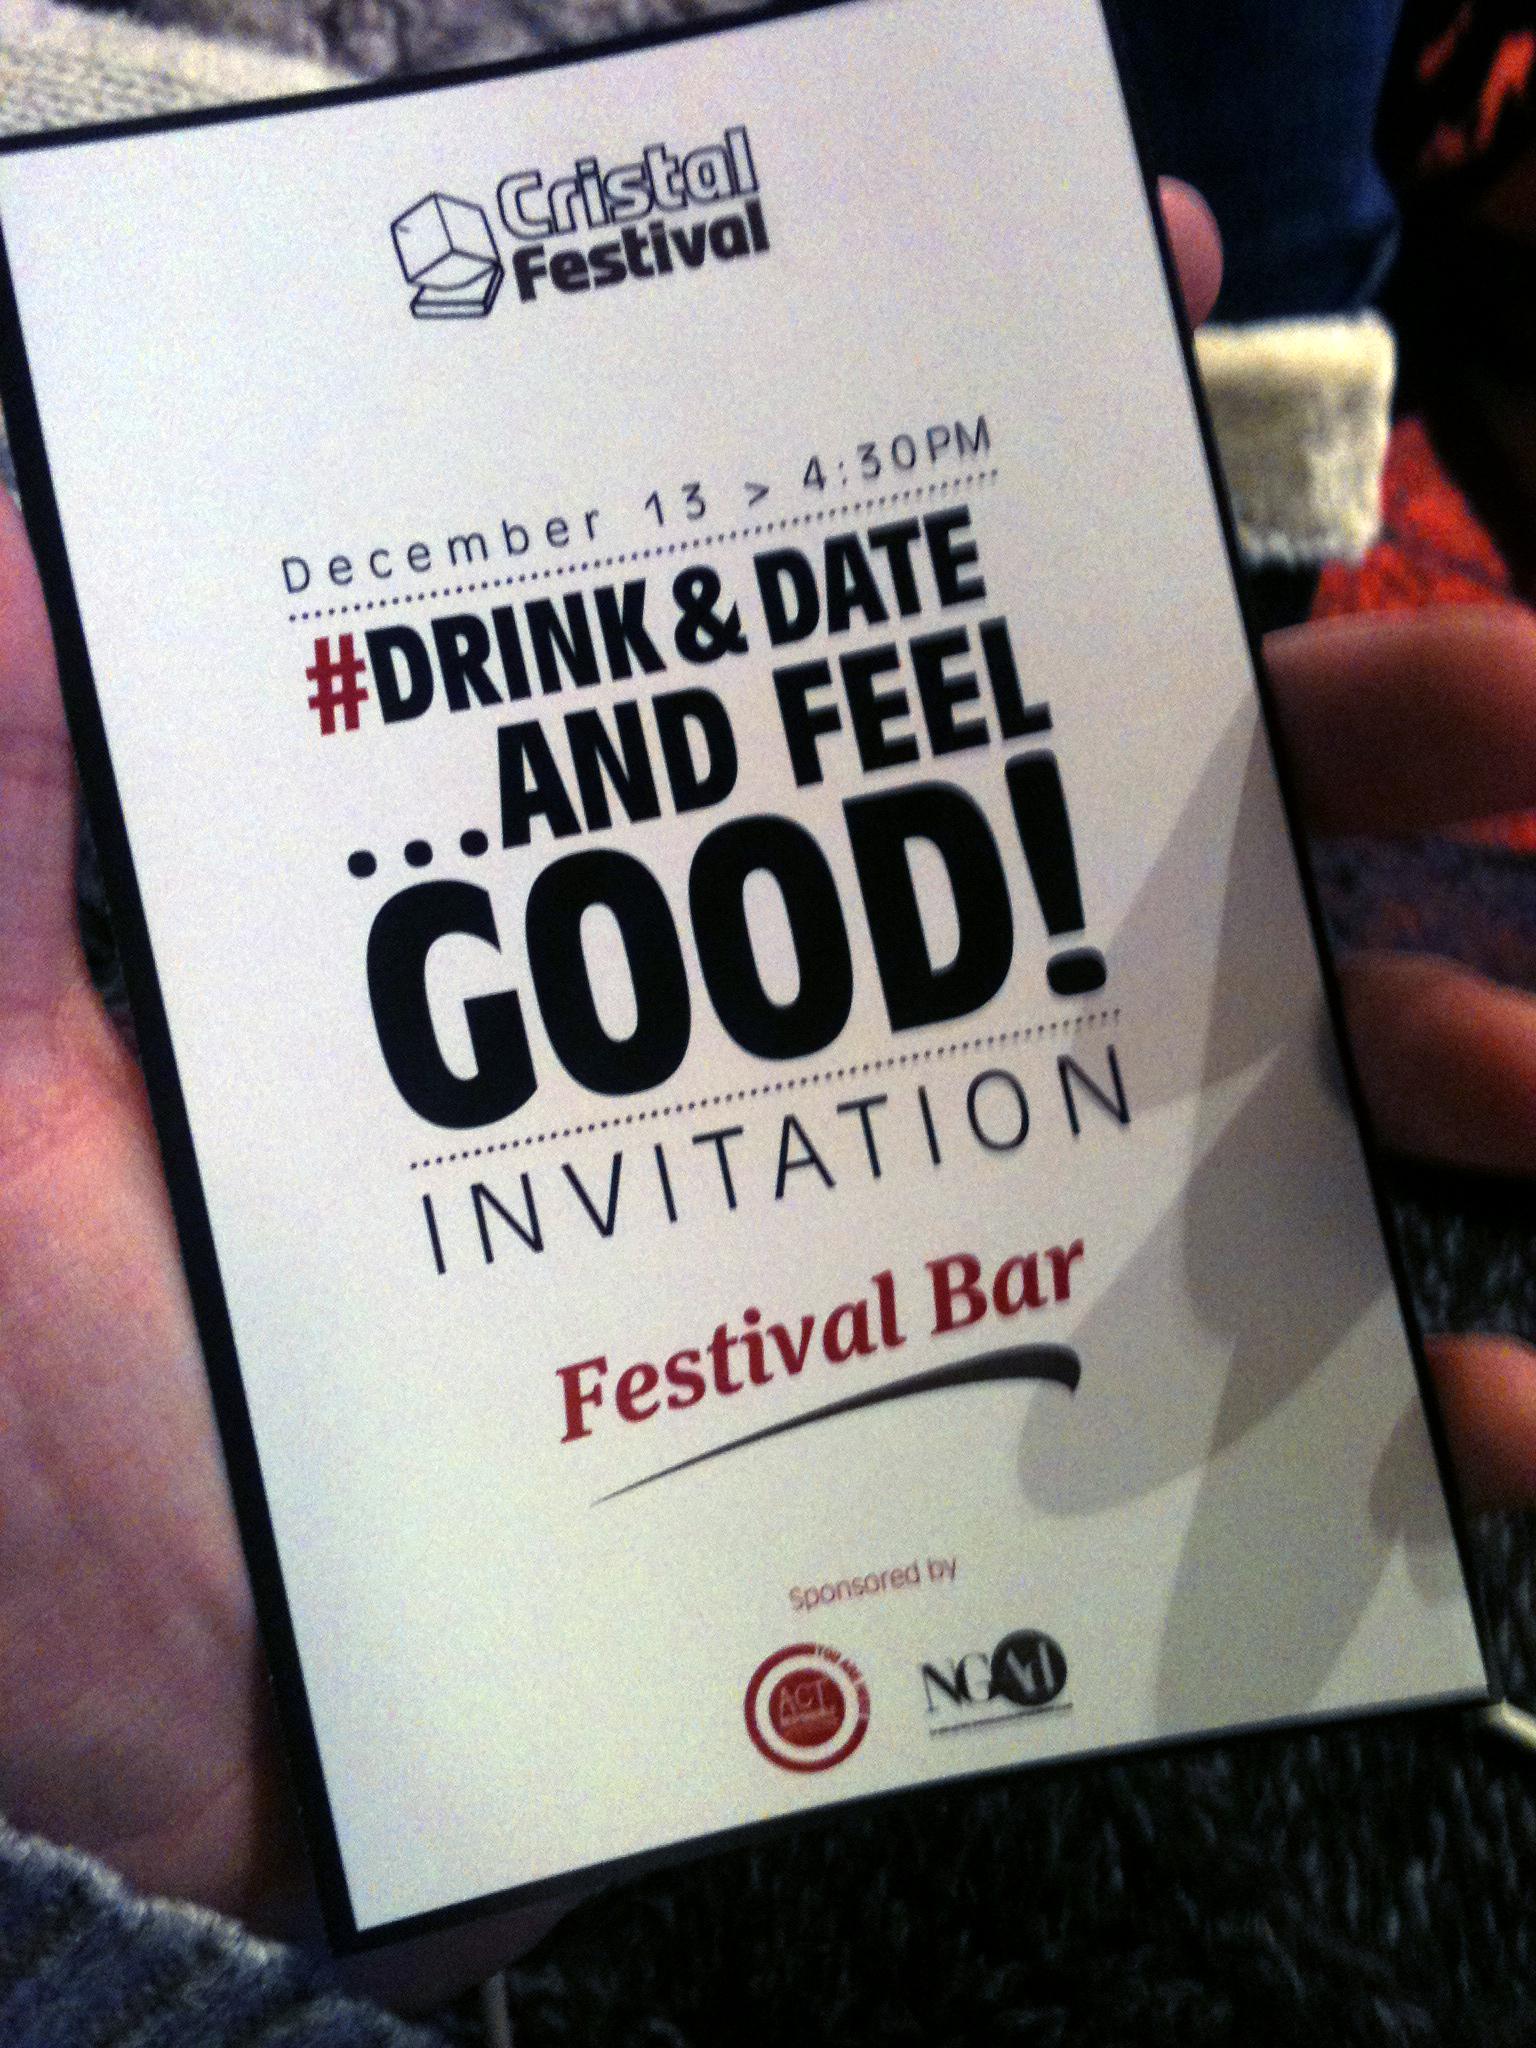 #Drink&Date